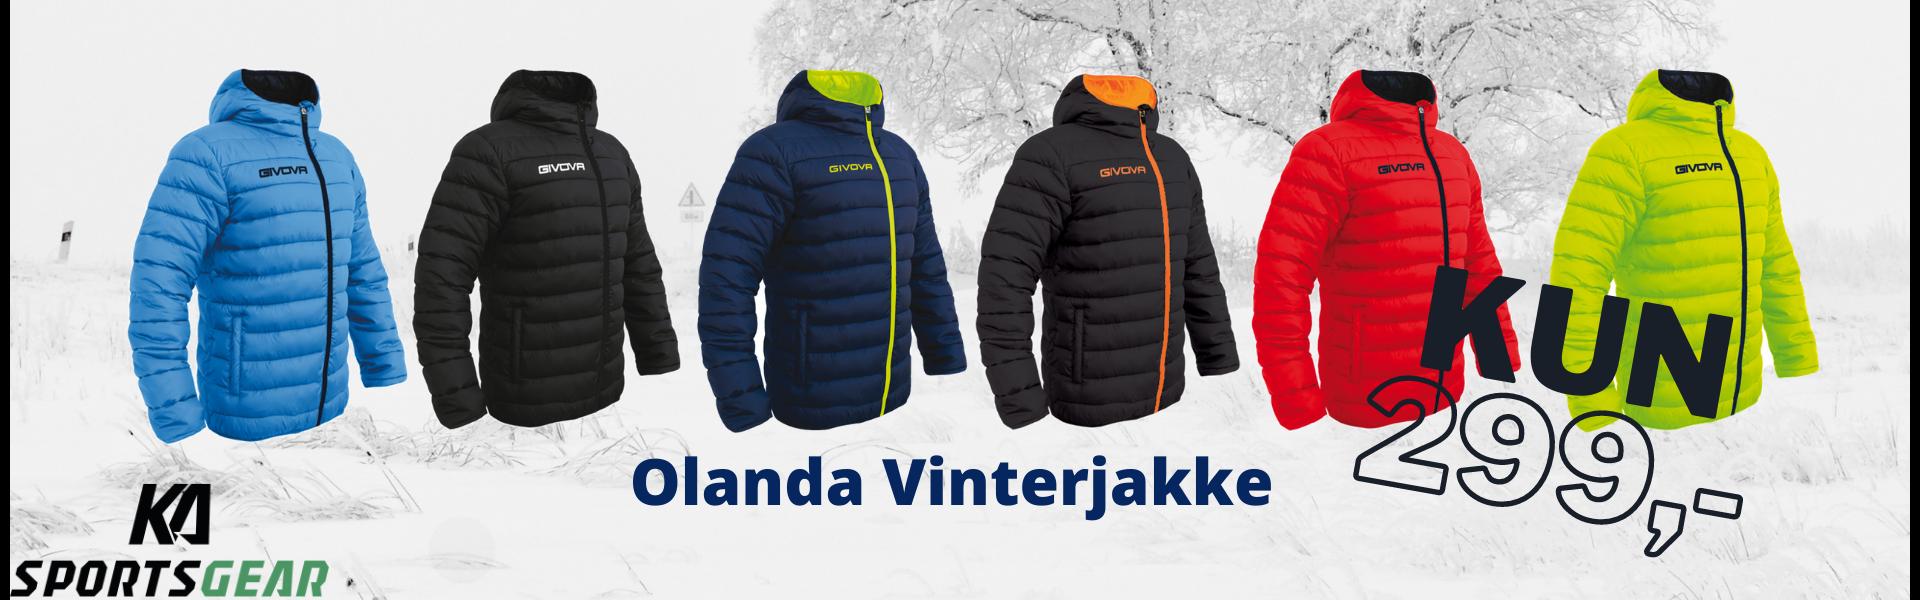 Olanda Vinterjakke - når du hader at fryse!!